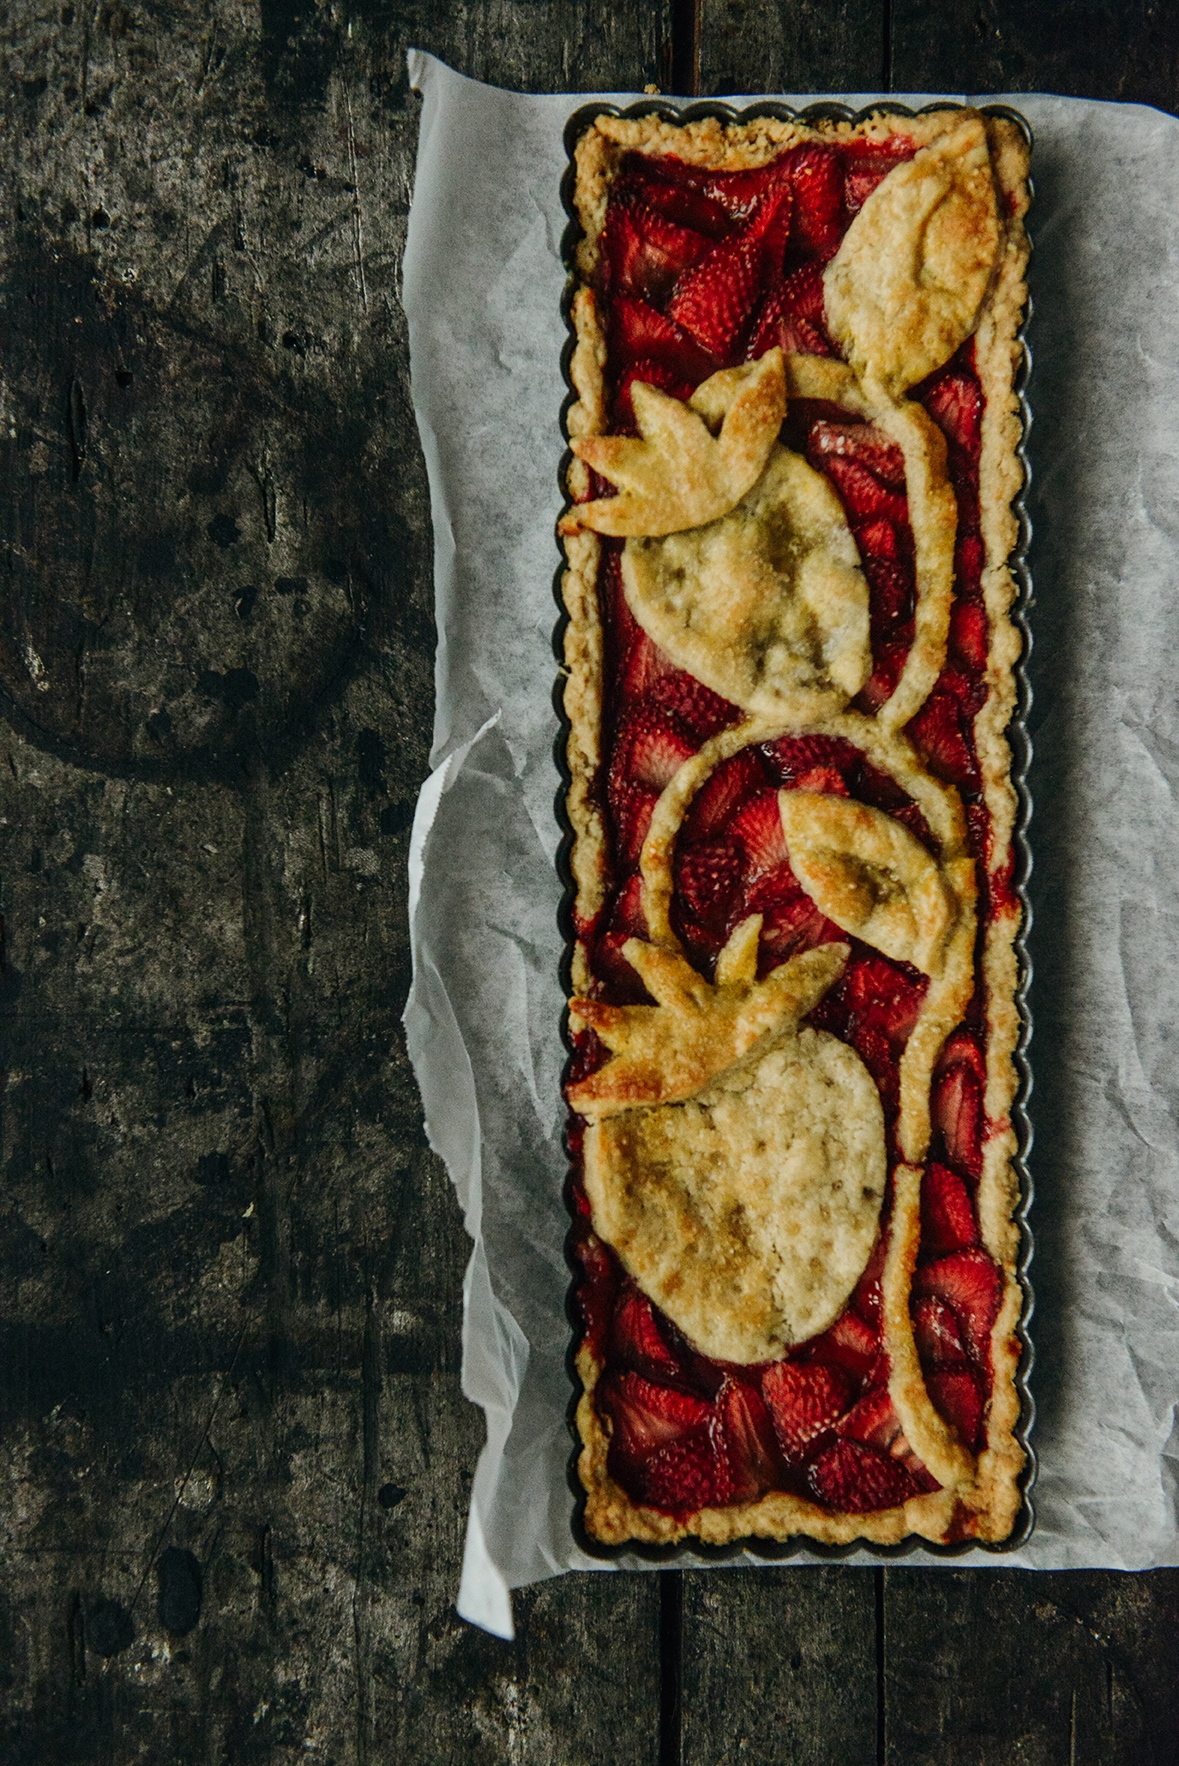 Strawberry Tart with an Oat Flour Crust // www.WithTheGrains.com